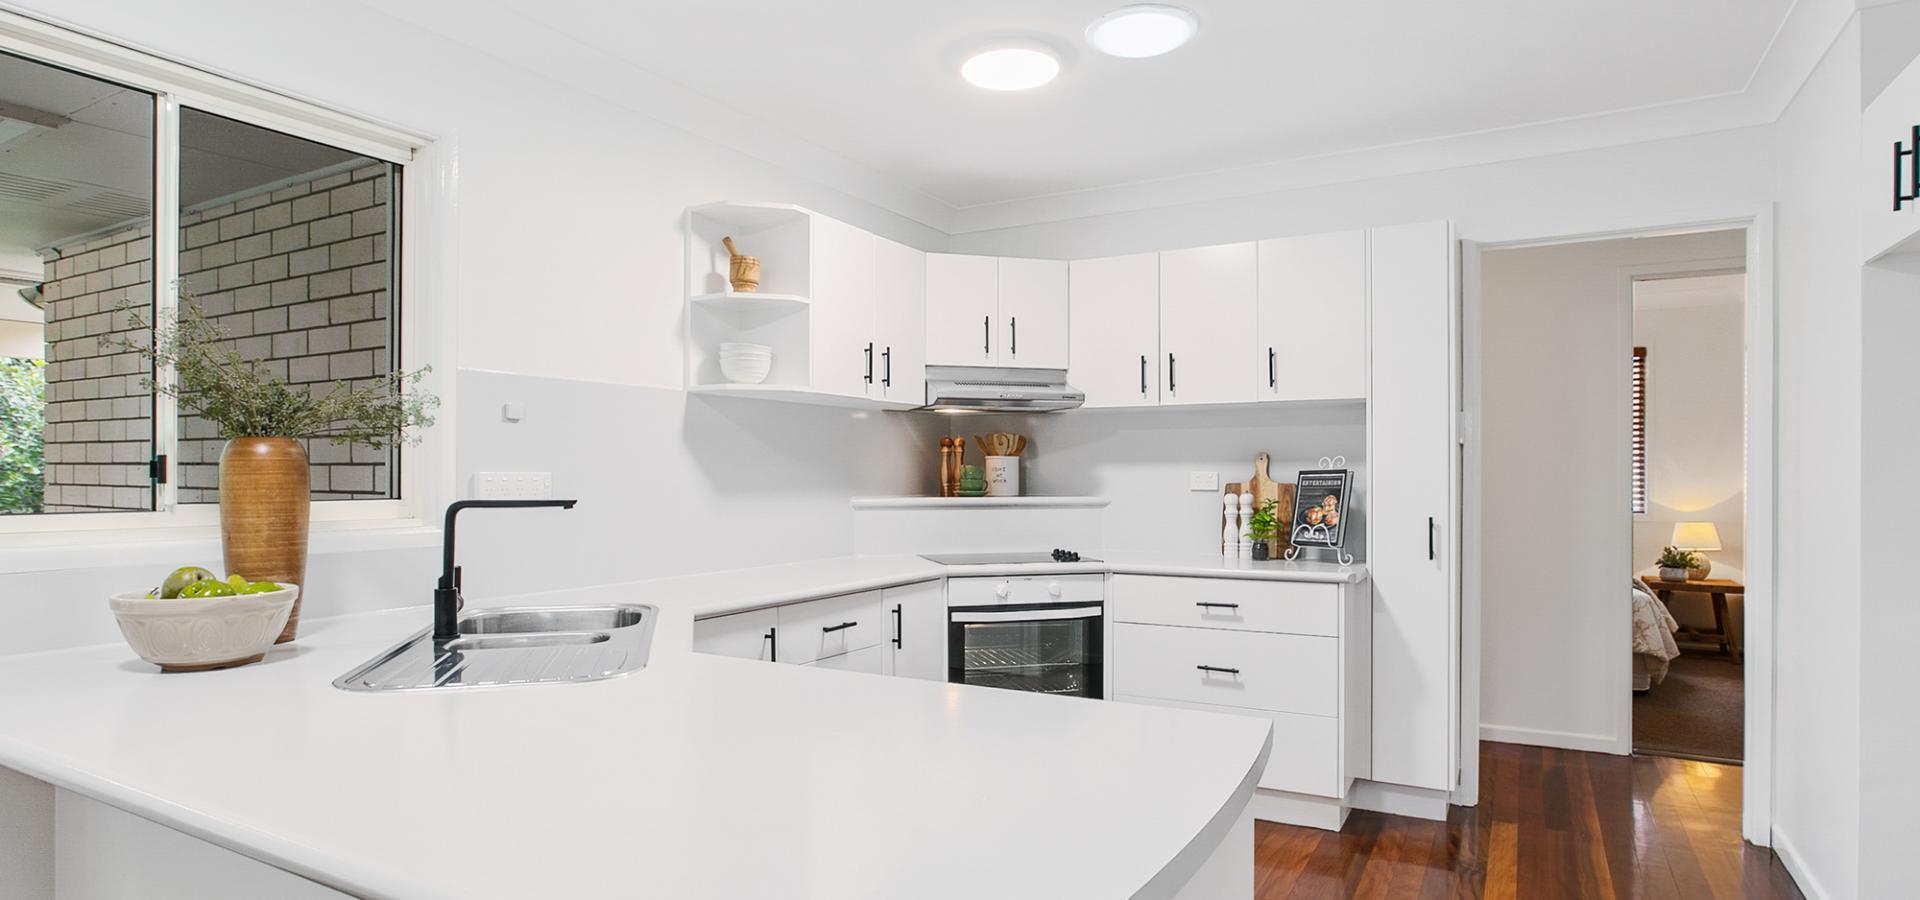 Fresh and Modern - Spacious Coorparoo Home